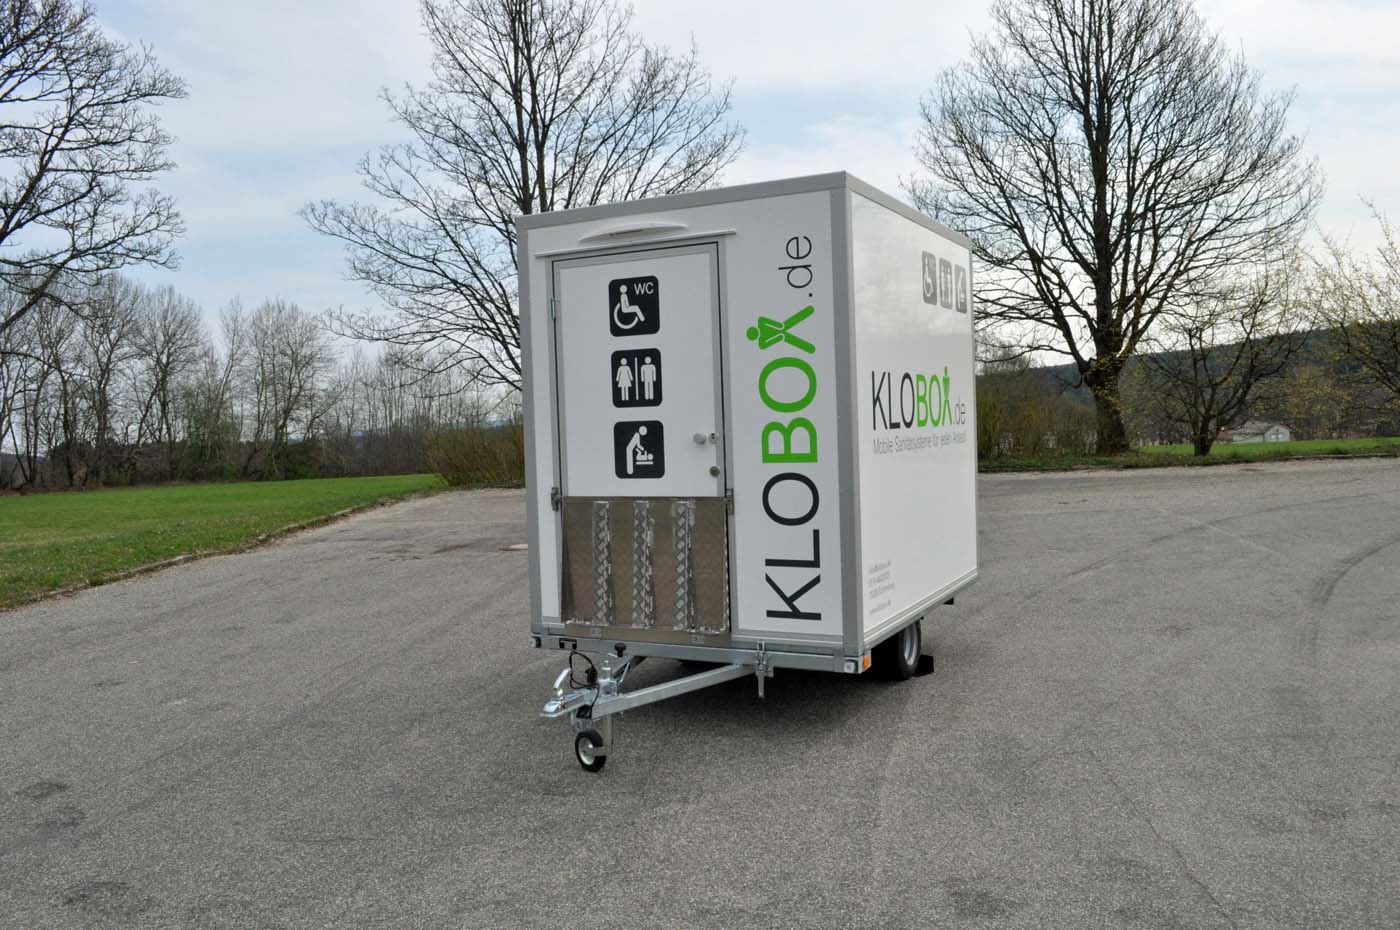 KLOBOX 250 [KX-1702] #11